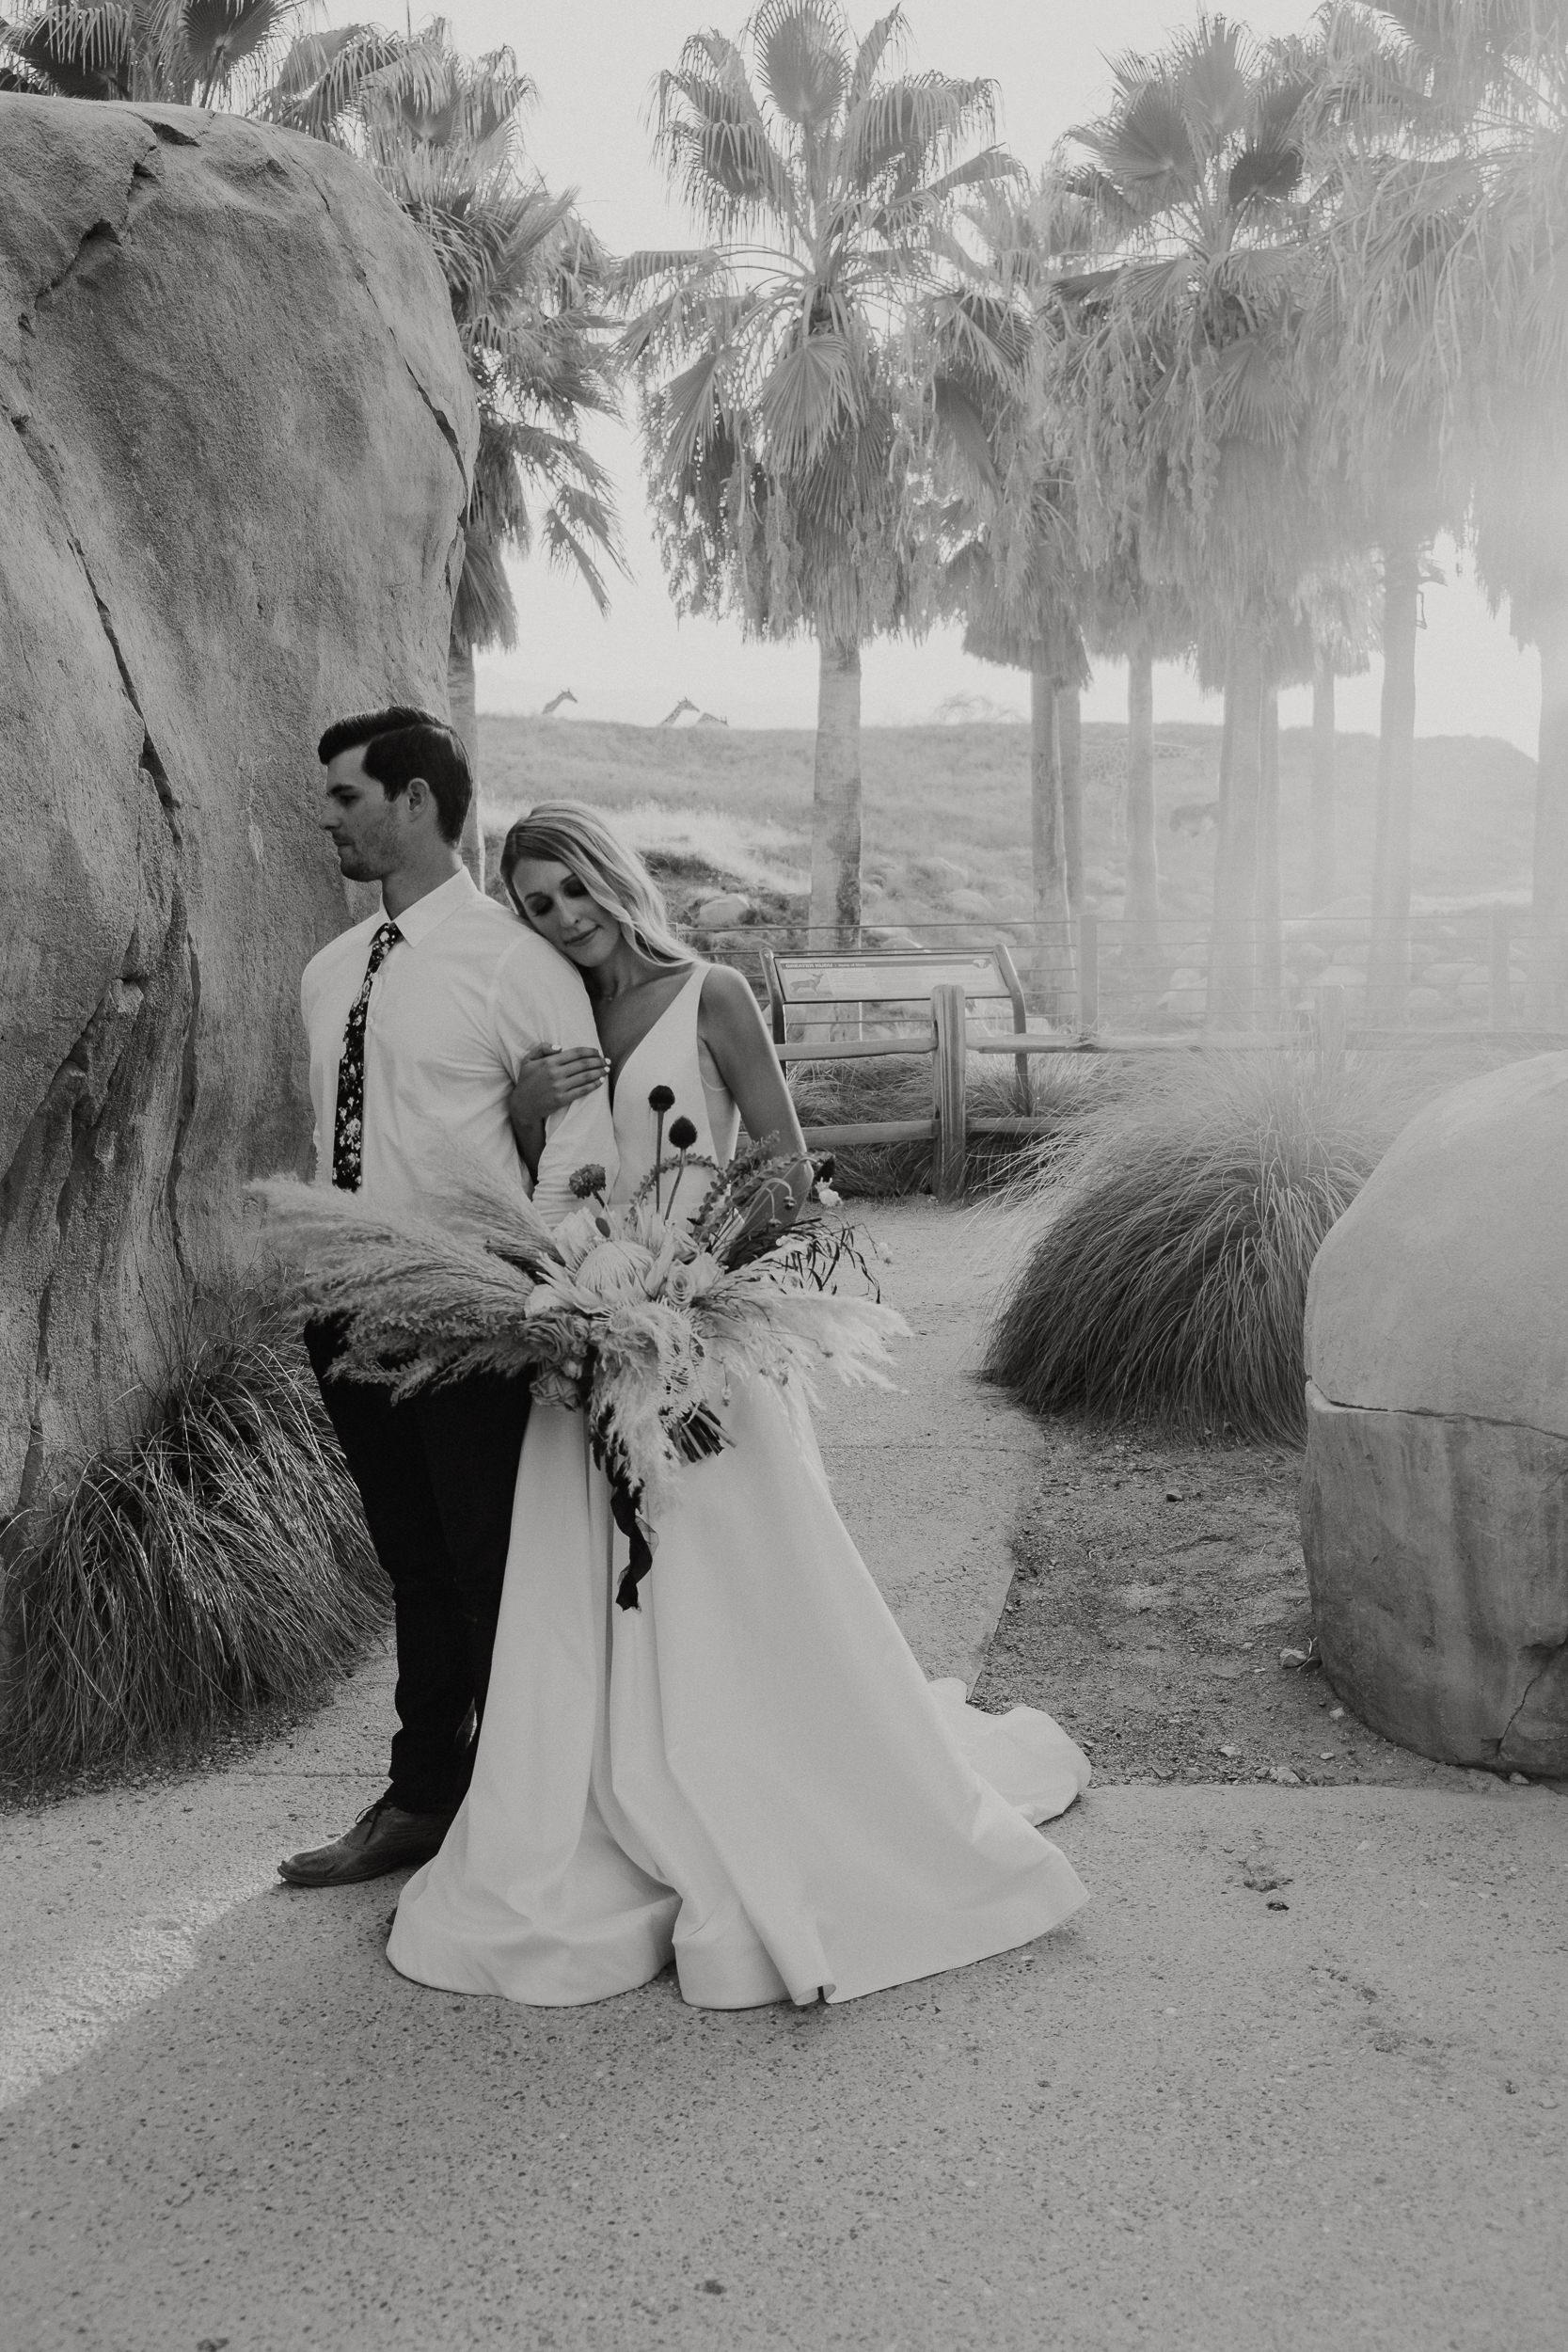 sChelsie + Chris - The Desert Shootout Wedding Romantics at The Living Desert-29.jpg